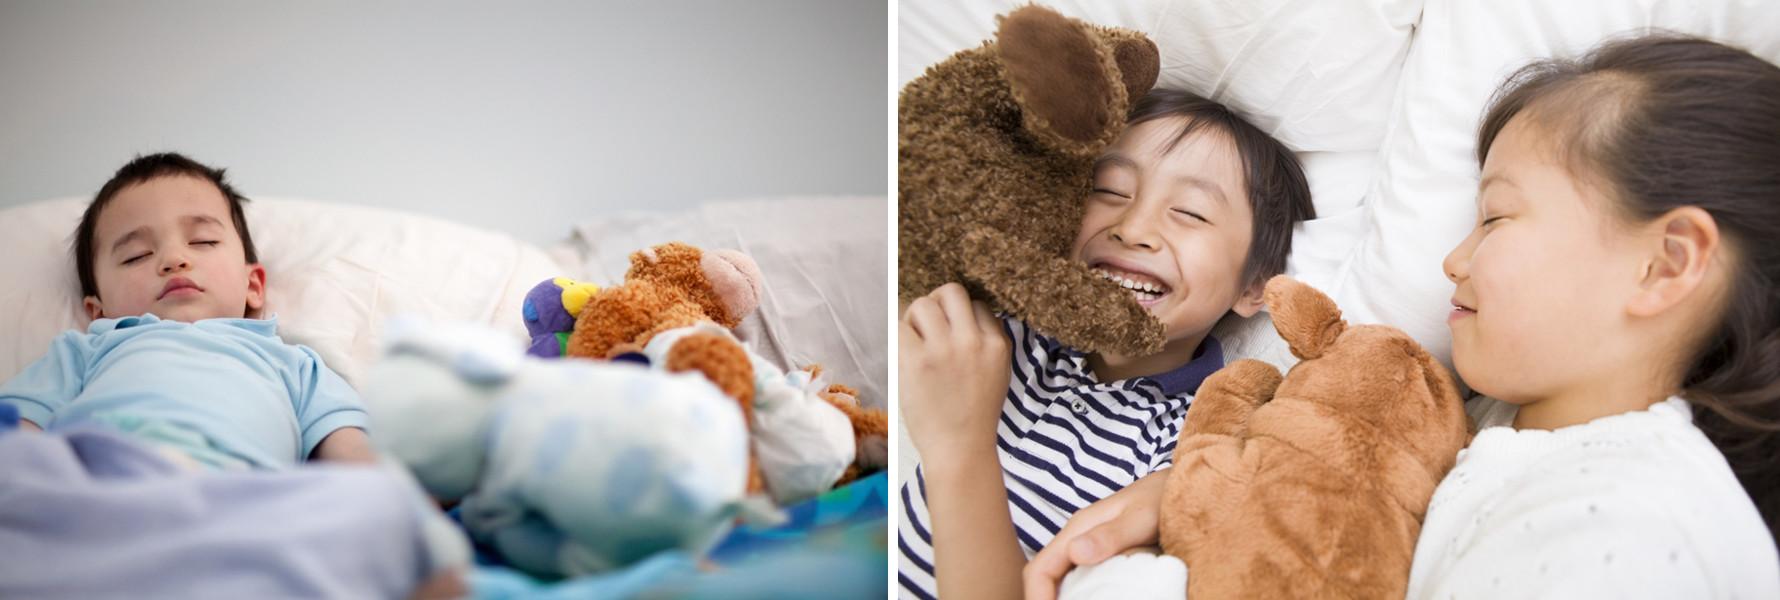 bedtime-guided-imagery-for-children